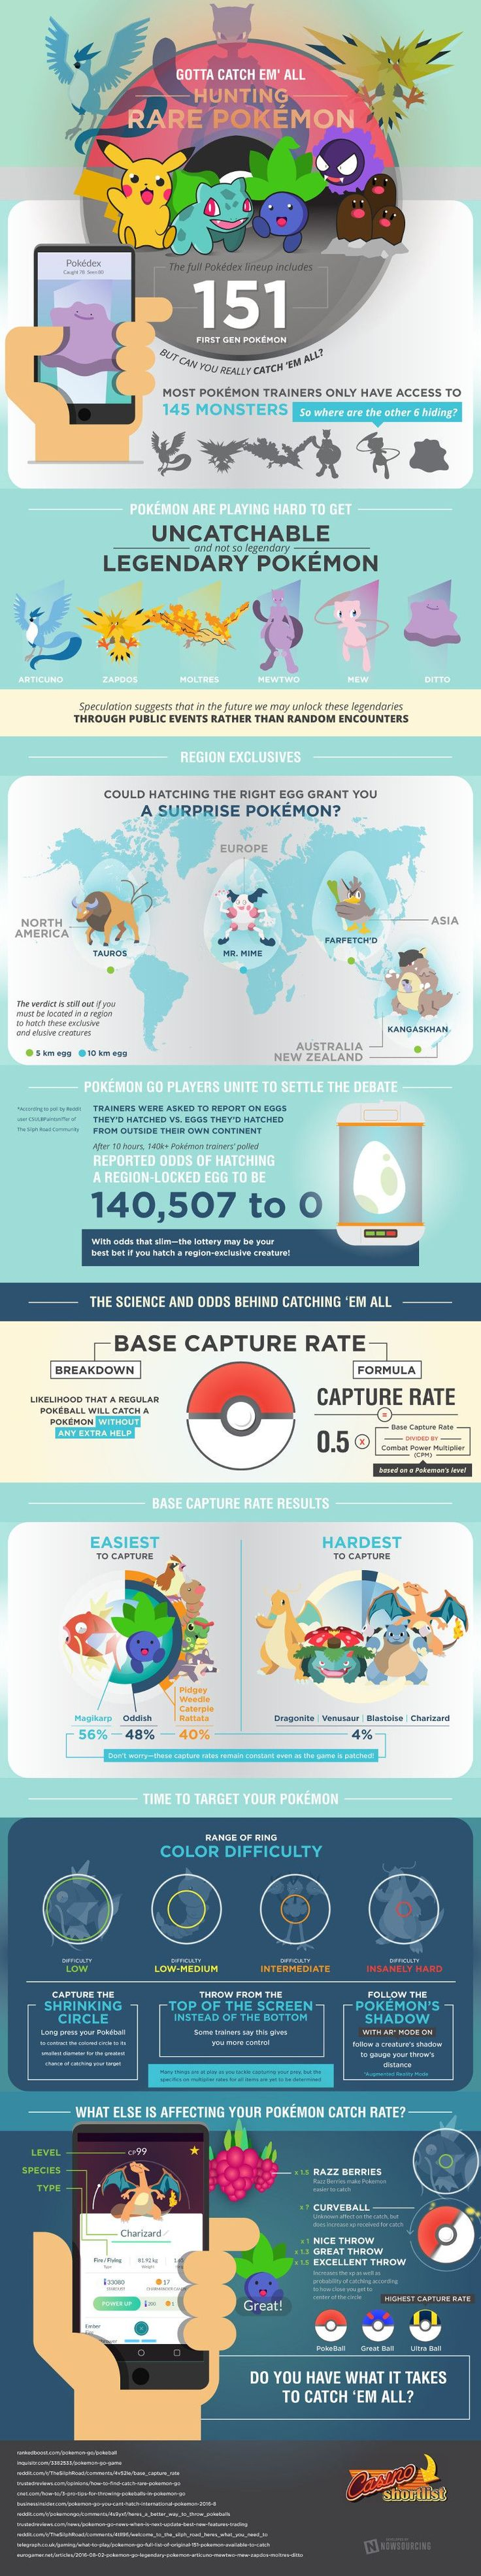 How To Find Rare And Legendary Monsters In Pokemon GO [Infographic] | Lifehacker Australia #pokemongotricks